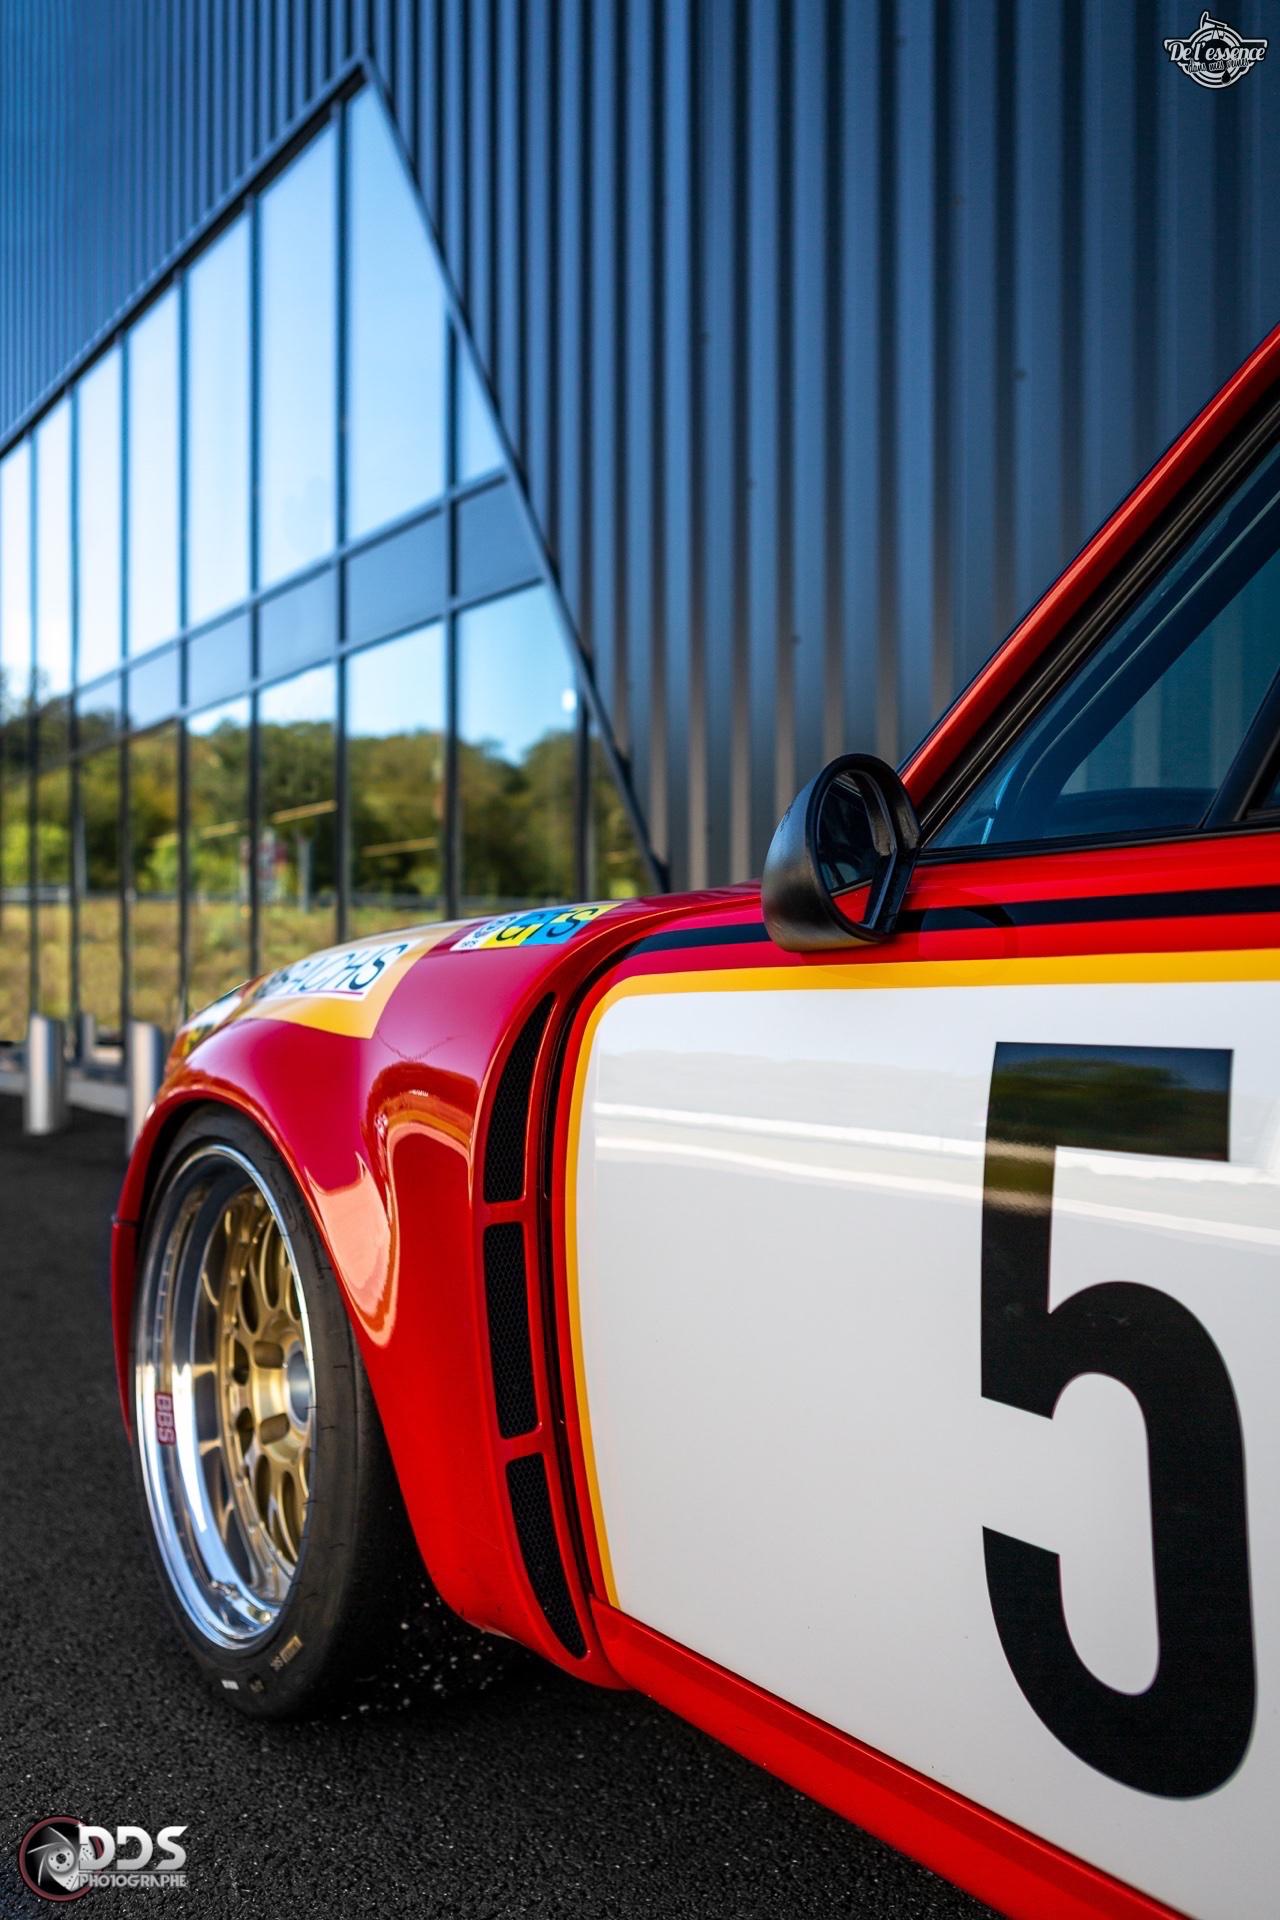 Porsche 911 RSR - 50% restomod, 50% course, 100% MCG Propulsion 16